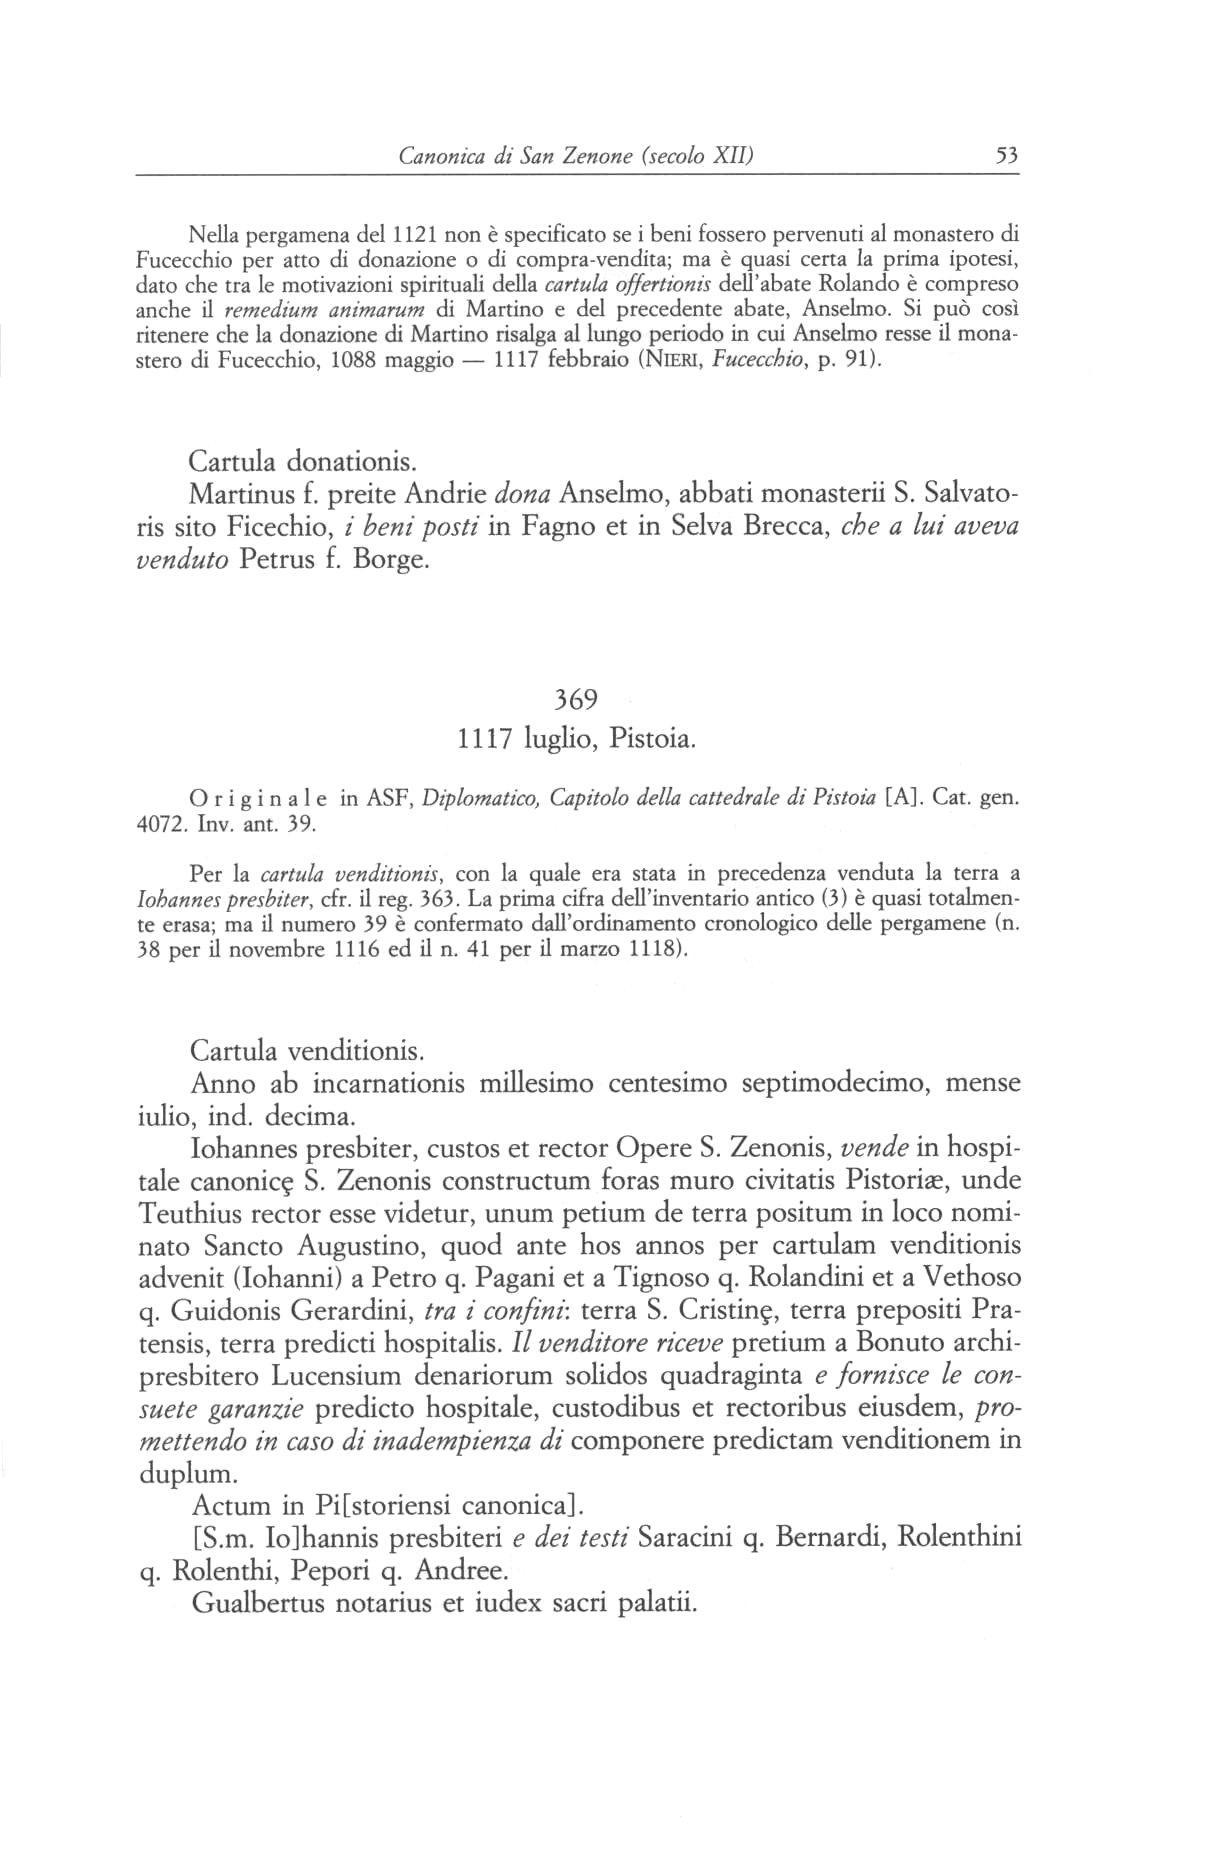 Canonica S. Zenone XII 0053.jpg